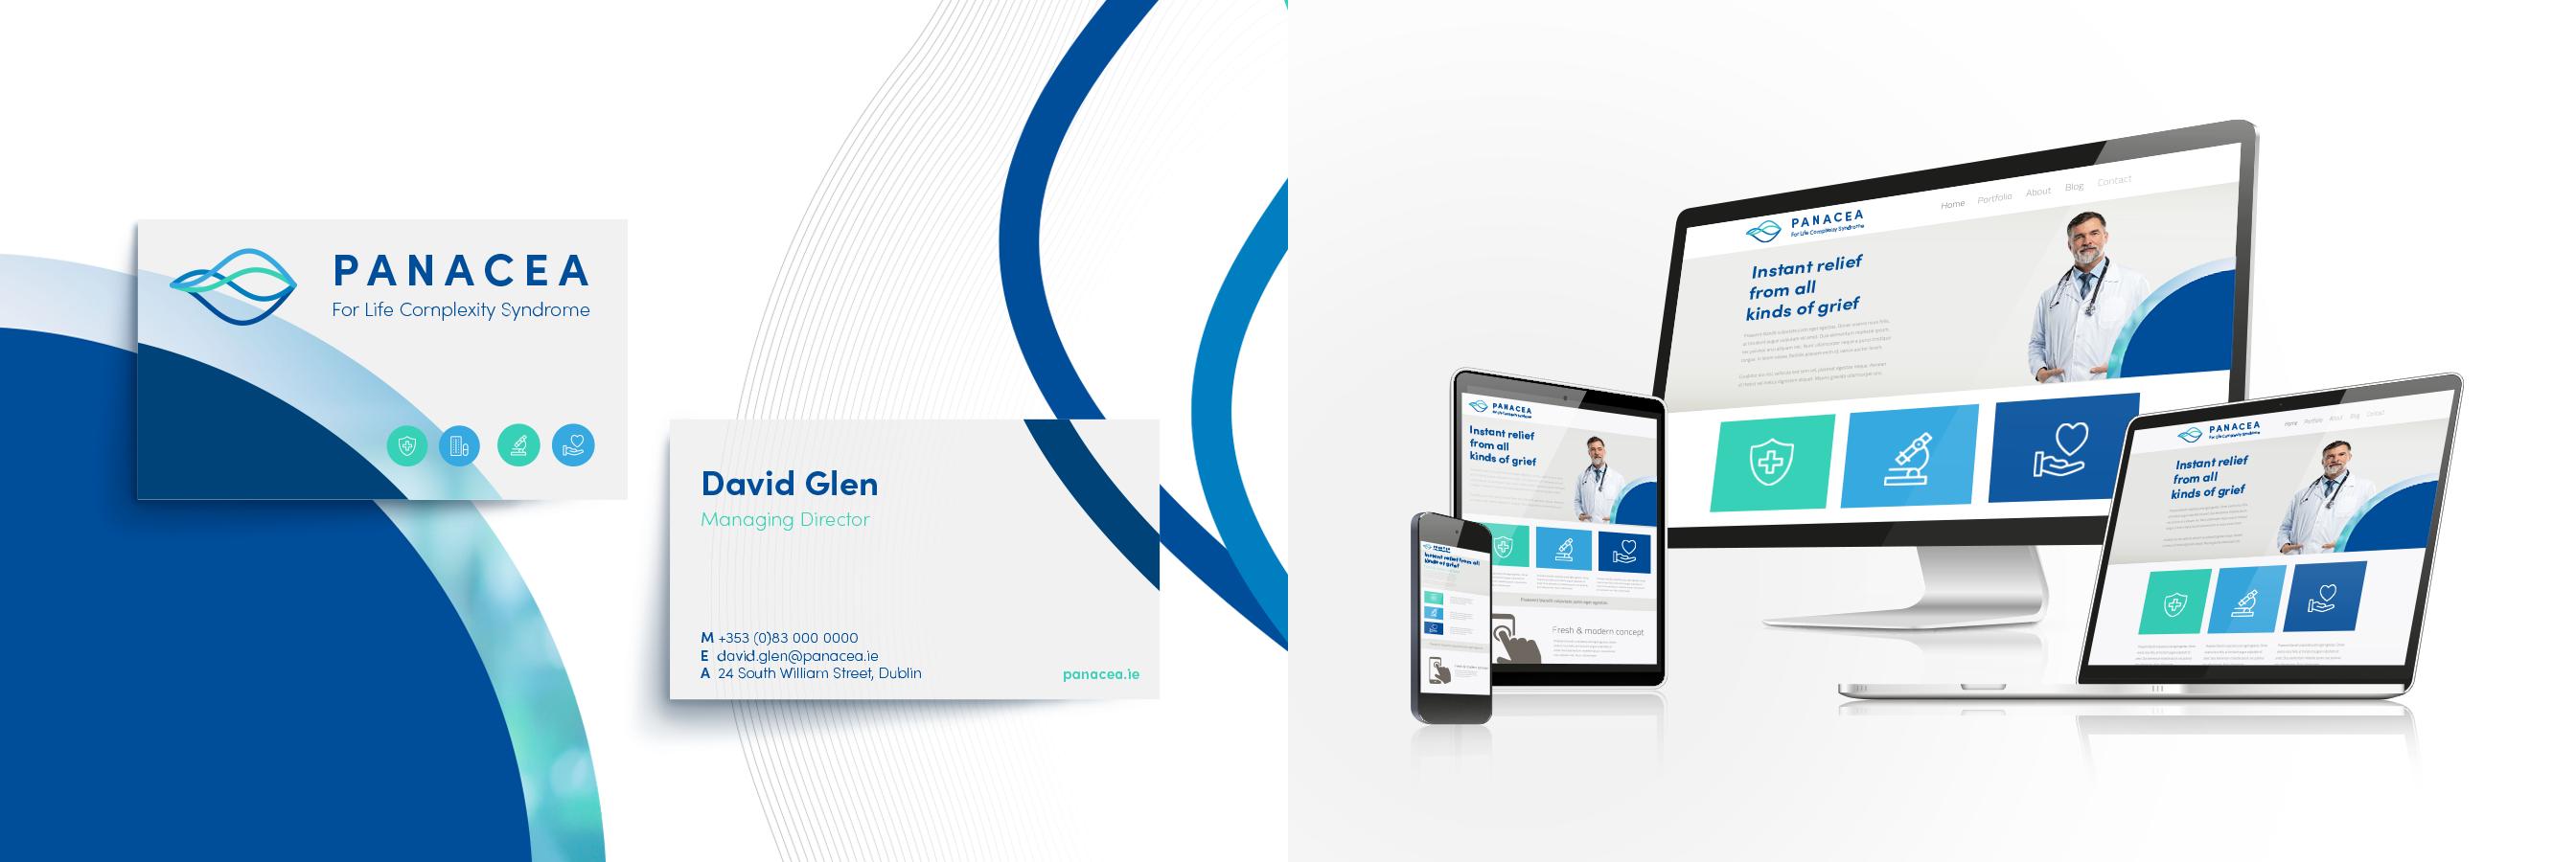 Pancea Healthcare Marketing Business Cards Responsive Website